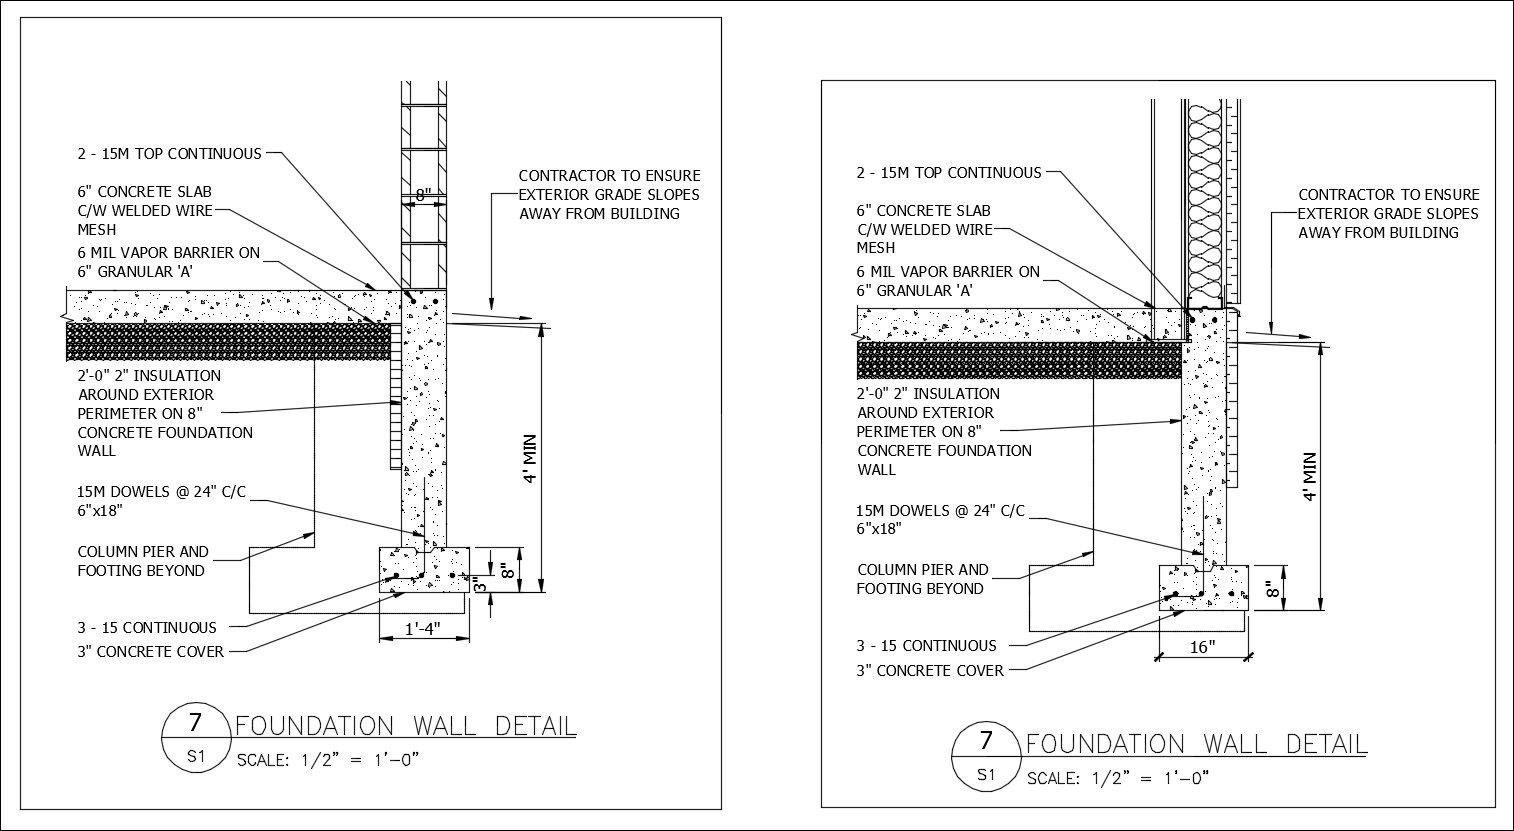 Free CAD Details-Foundation Wall Detail – CAD Design | Free CAD ...